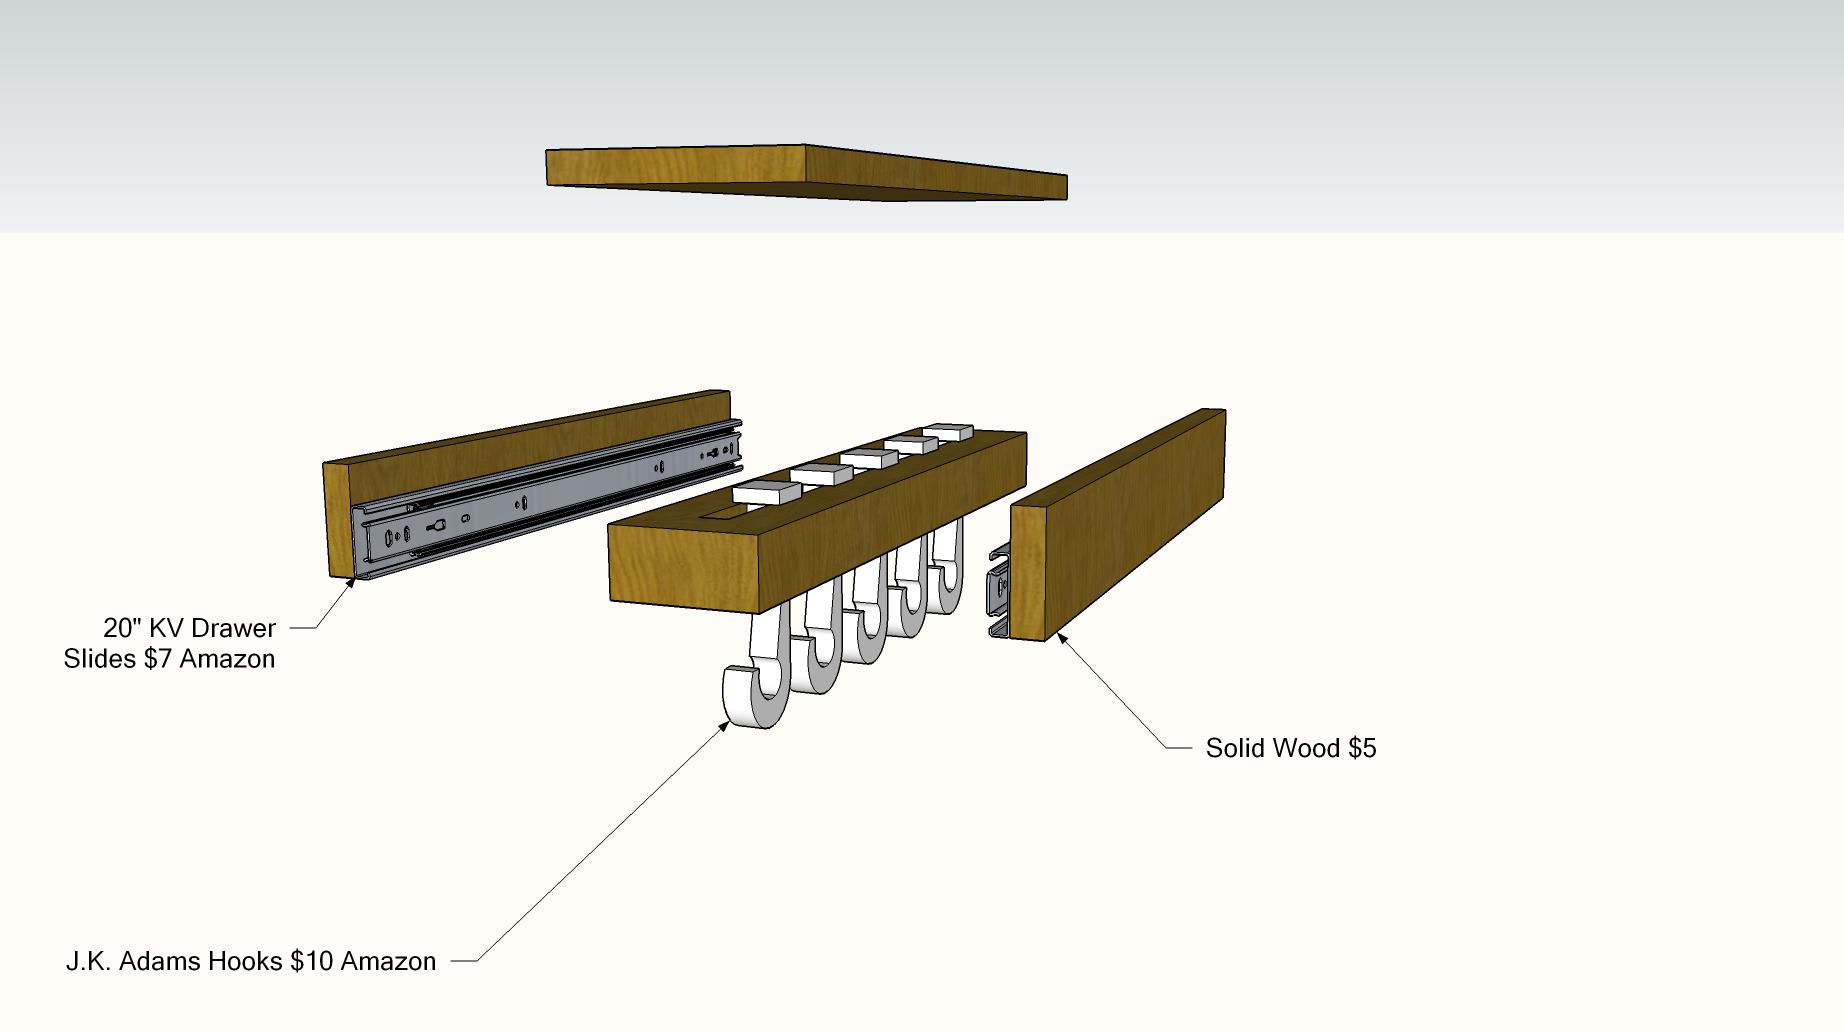 Diy sliding pot rack 2 like glideware storage system kitchen and dining room pinterest pot - Cabinet pull out pot rack ...